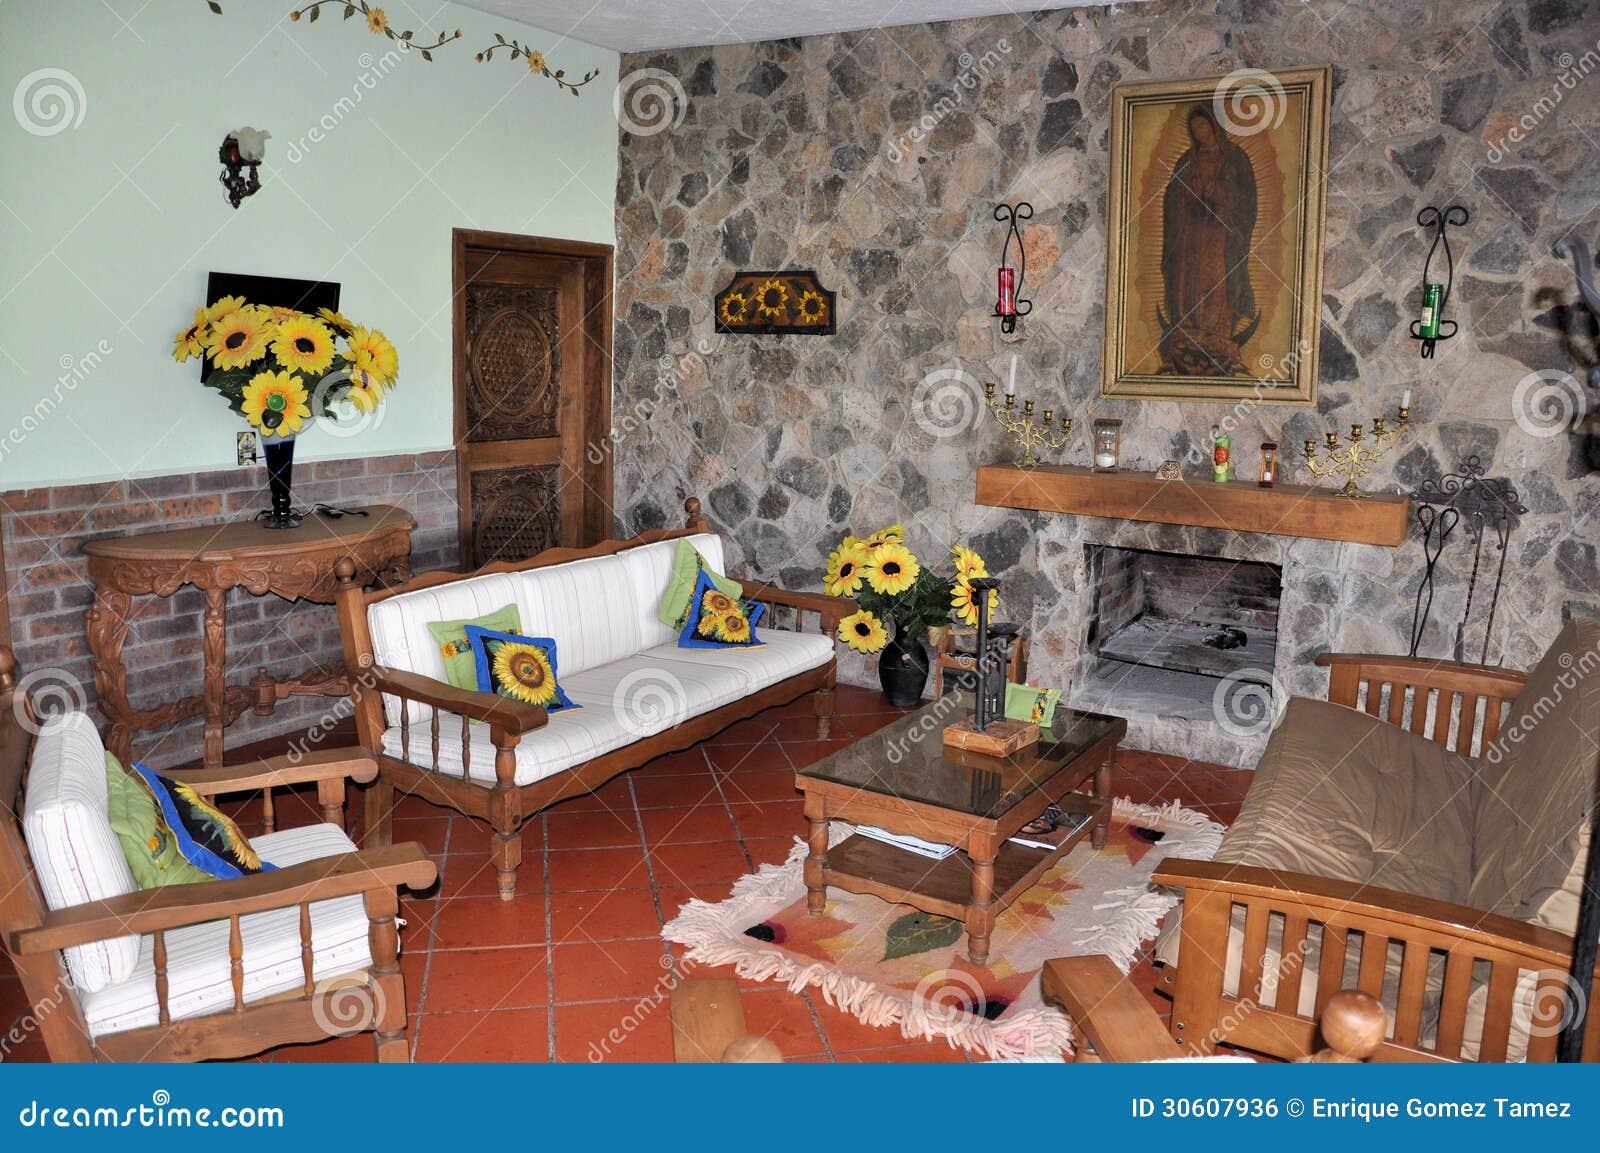 Pruzak Com Imagens De Sala De Estar Rustica Id Ias Interessantes  -> Sala De Estar Pequena E Rustica